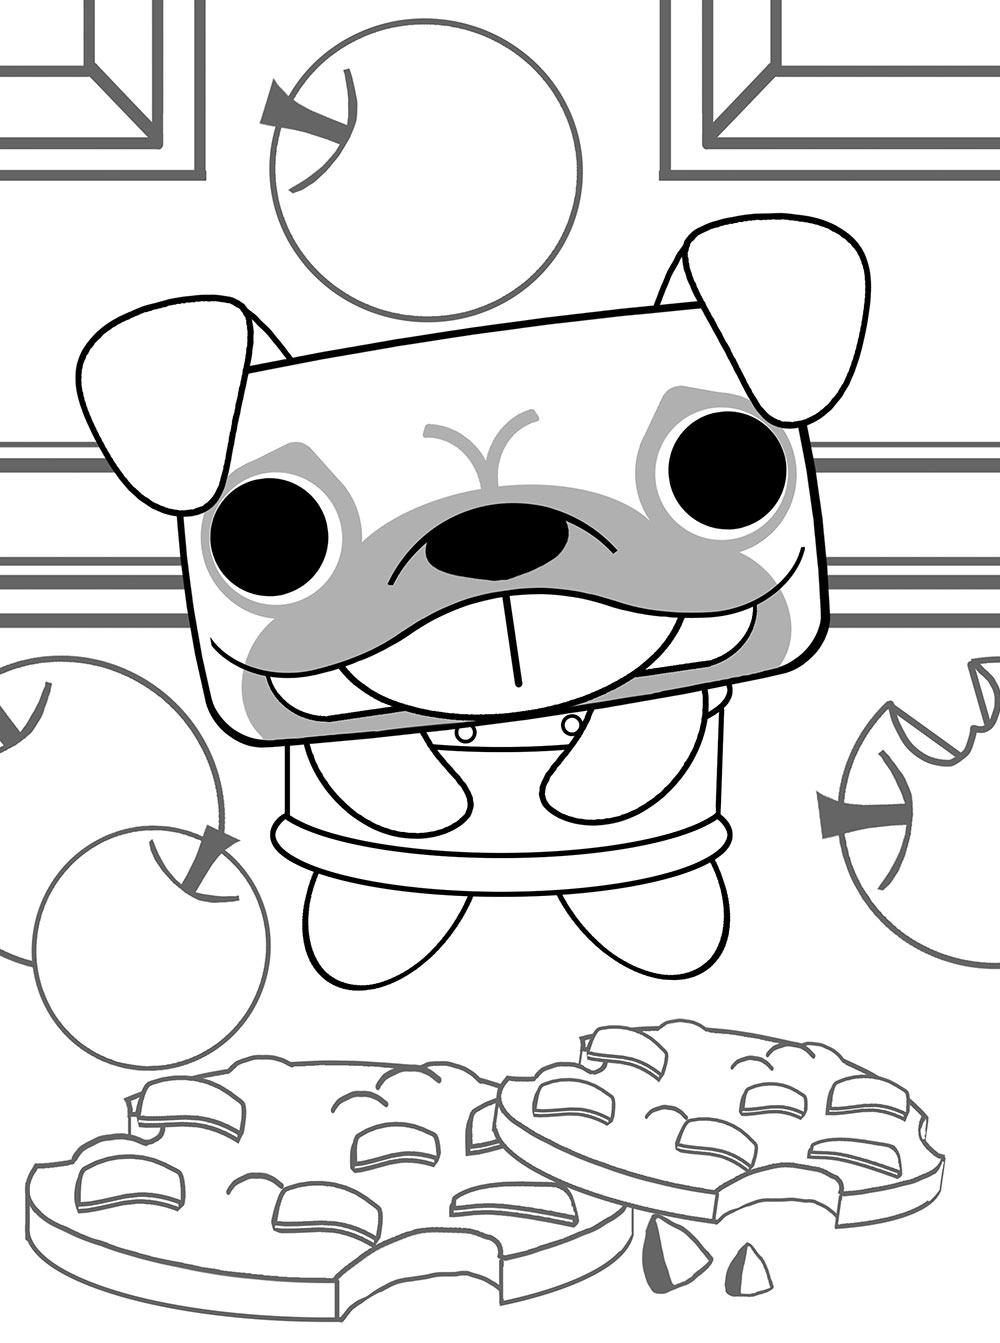 1000x1343 Uly Pug Canimals Dibujos Colorear E Imprimir Dibujalandia Sketch